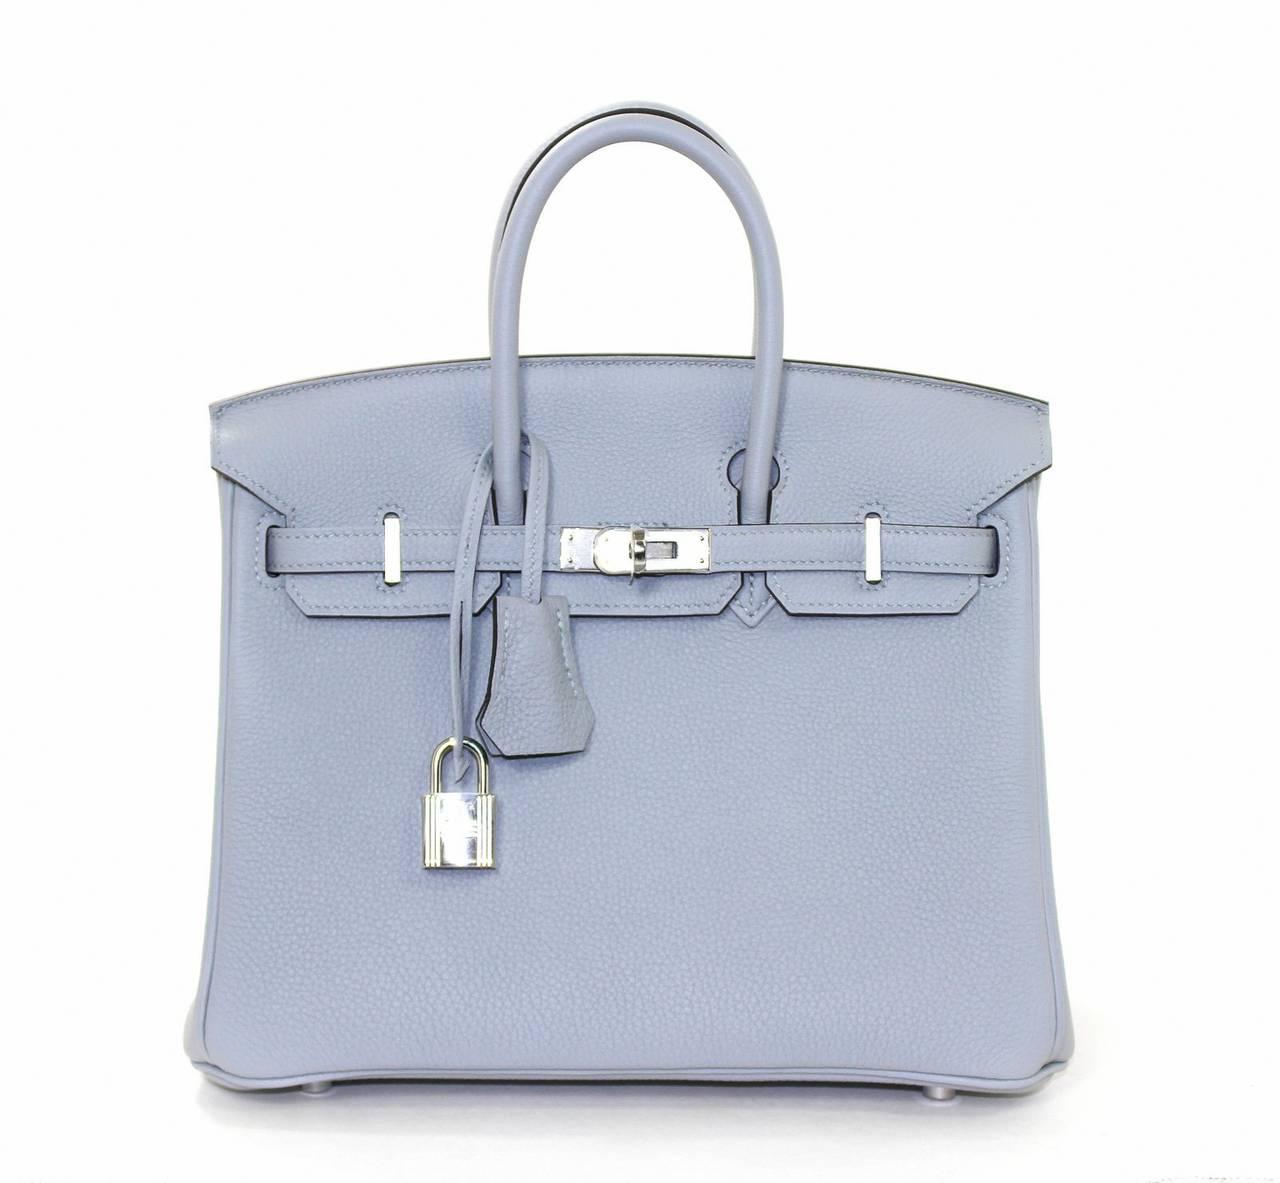 hermes birkin bag new